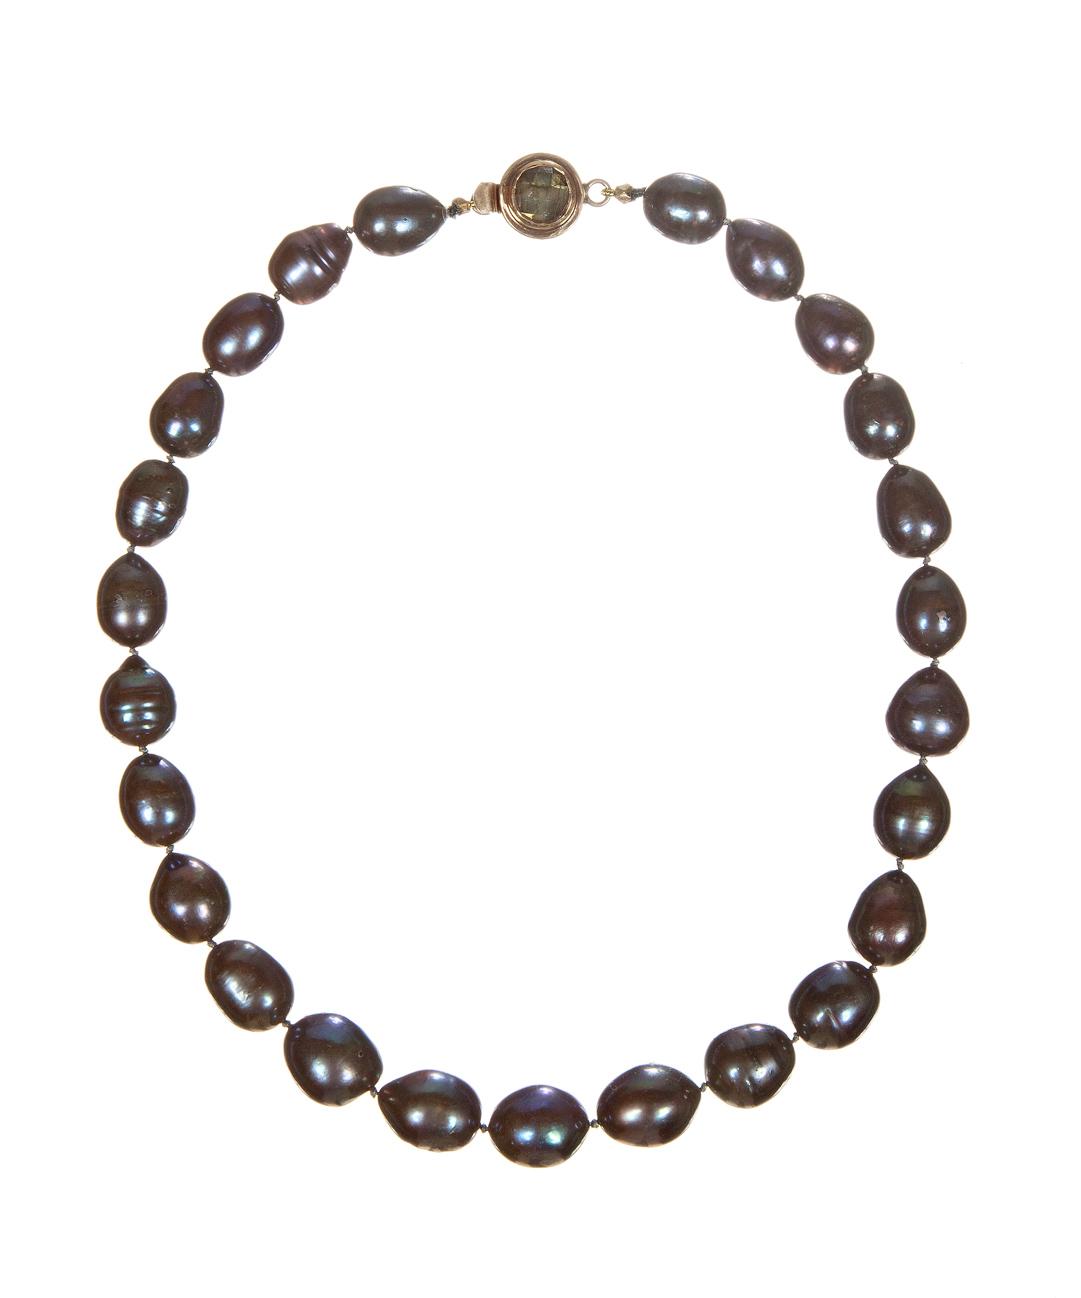 Black Pearl and Labradorite Necklace